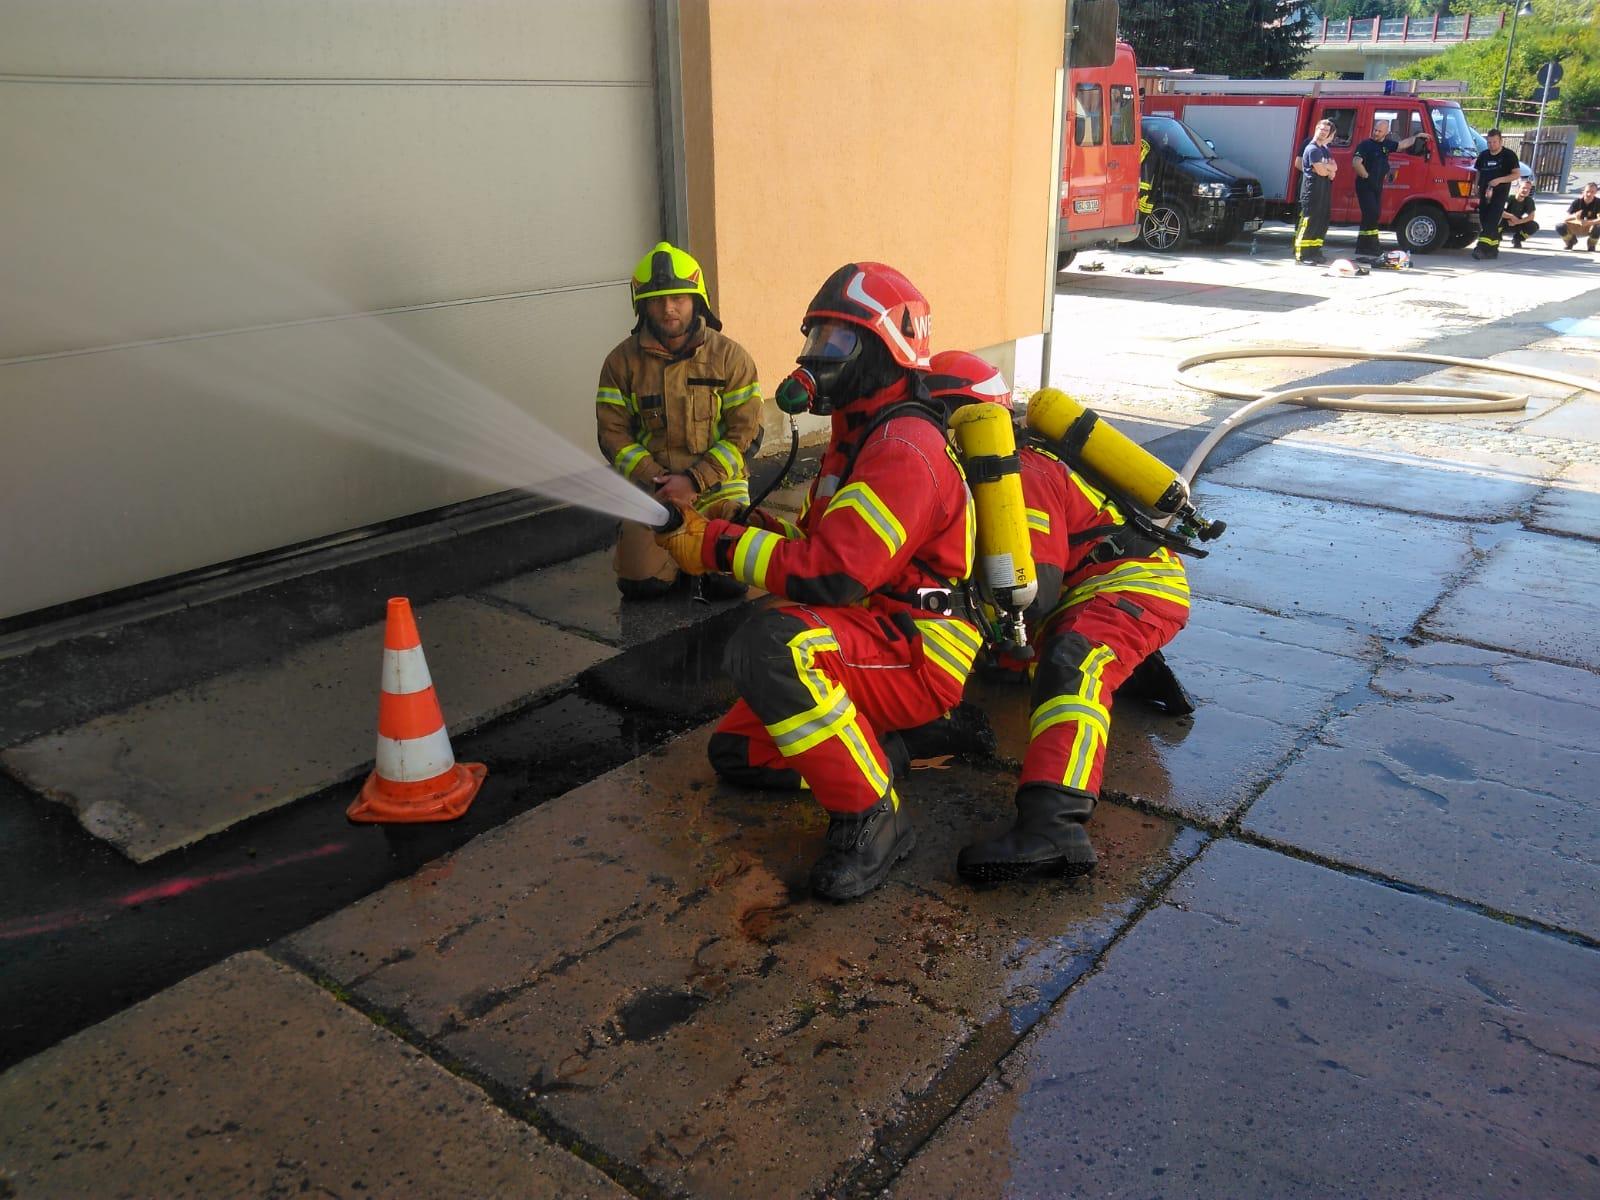 Atemschutz Lehrgang bei der Feuerwehr Weida